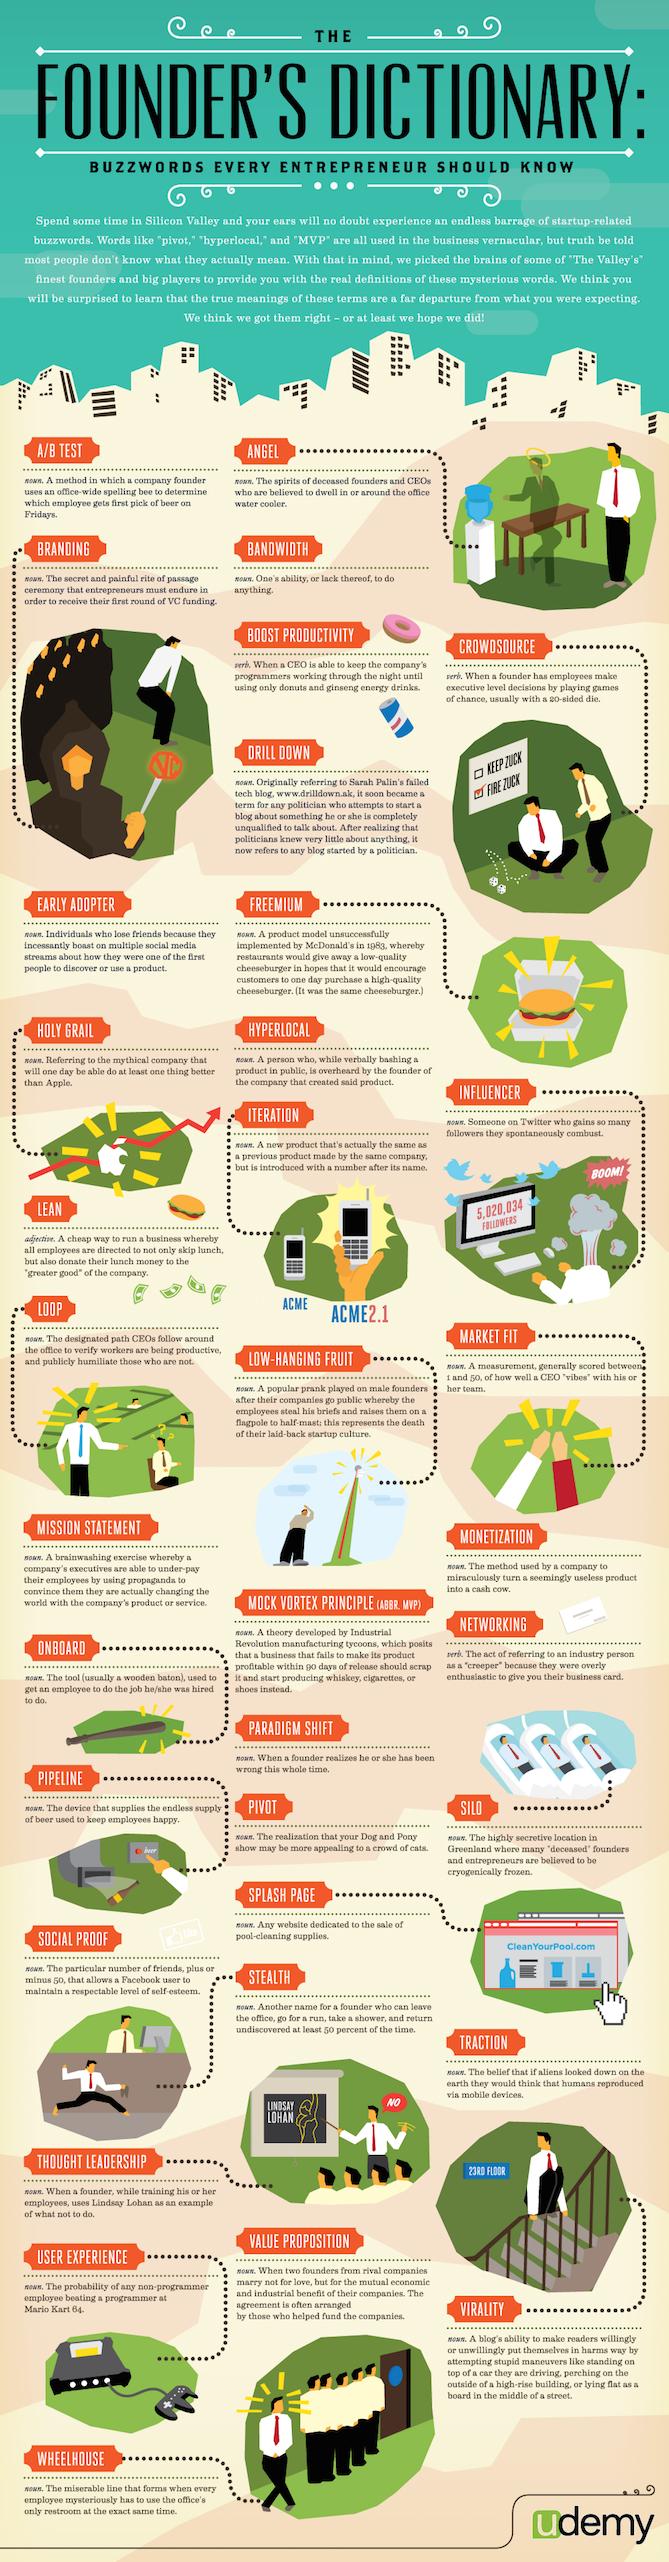 buzzwords-for-entrepreneurs-infographic